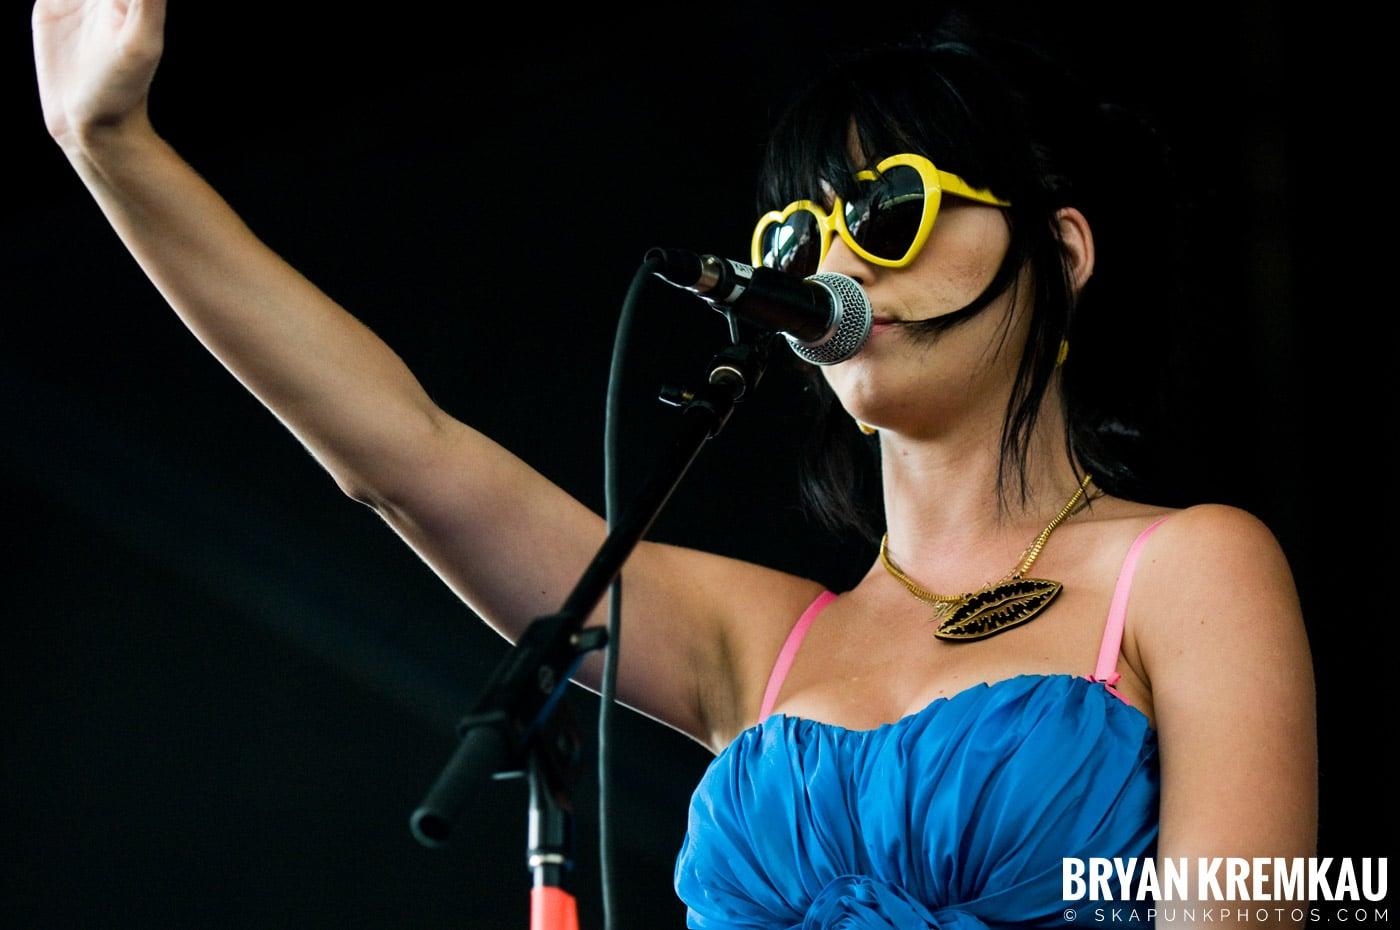 Katy Perry @ Warped Tour, Scranton PA - 7.27.08 (12)